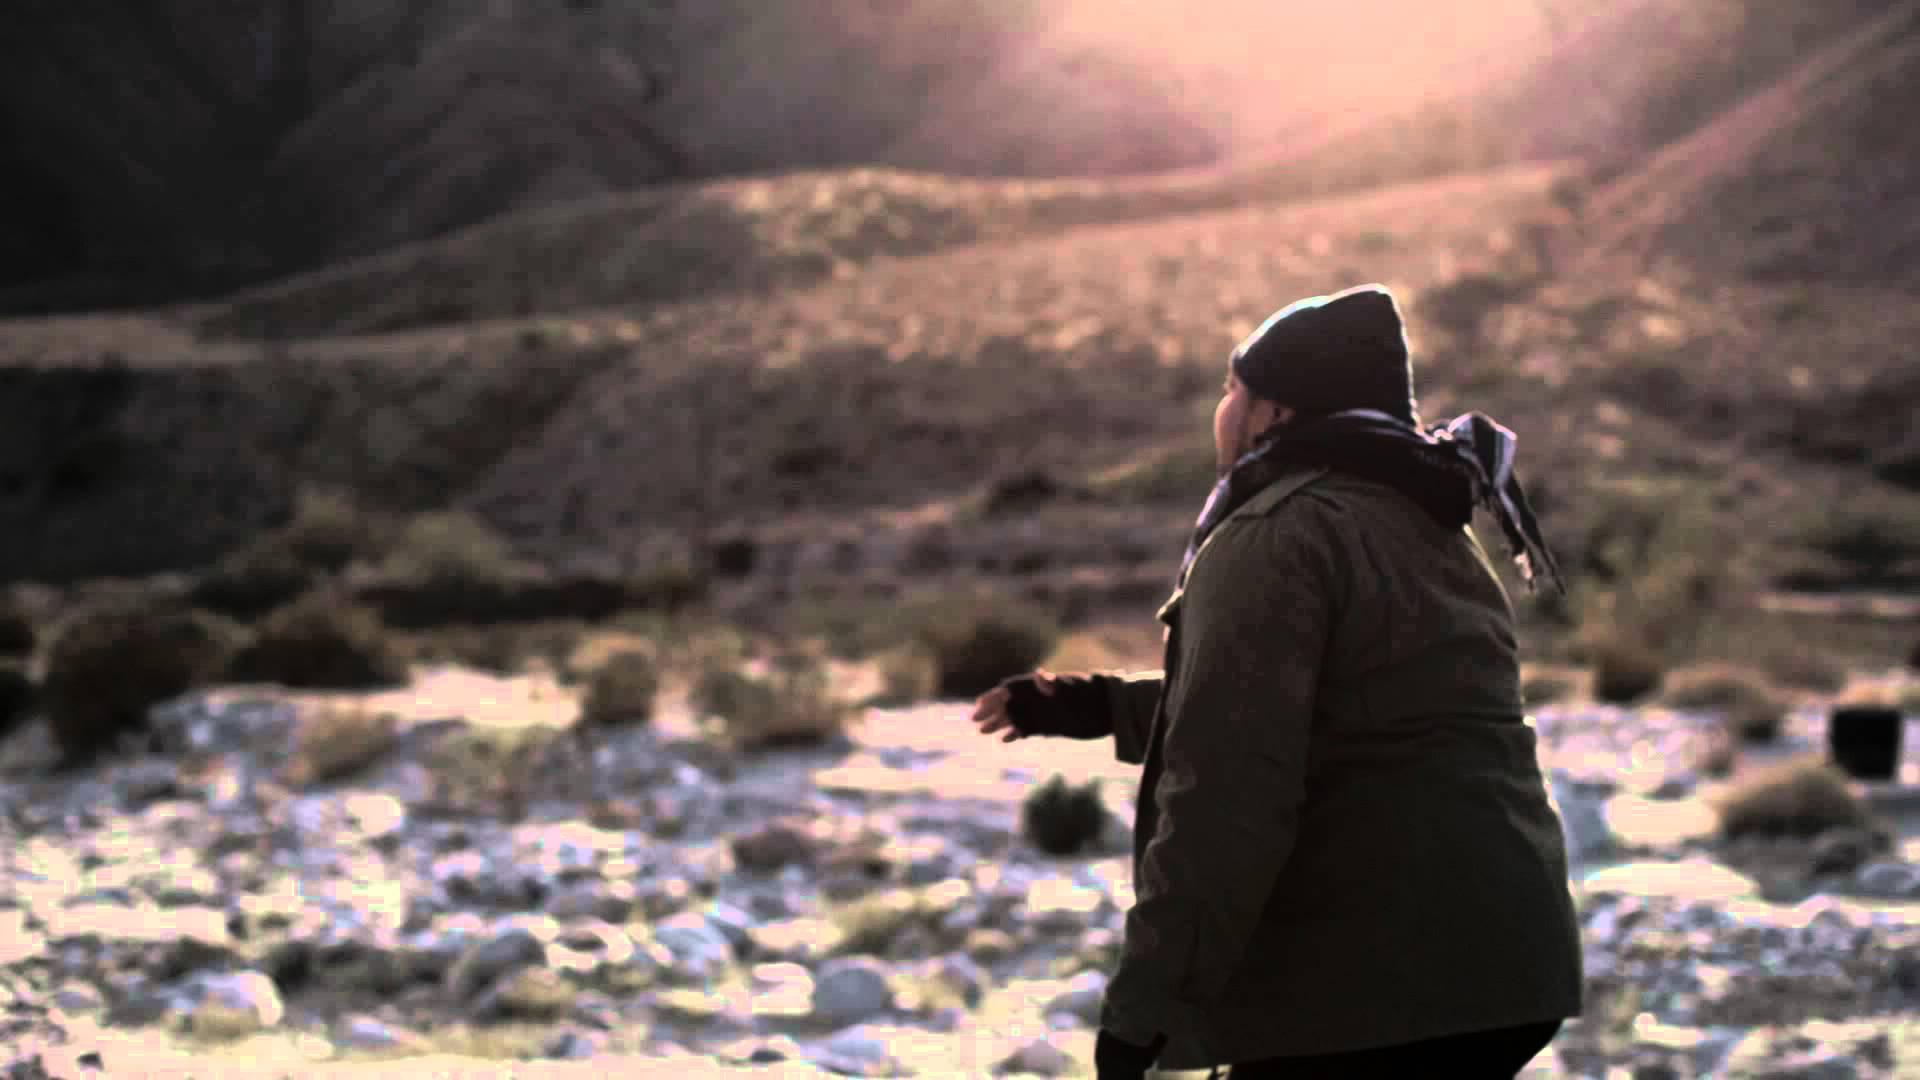 Tedashii – Below Paradise: Judge Me (Video) @tedashii